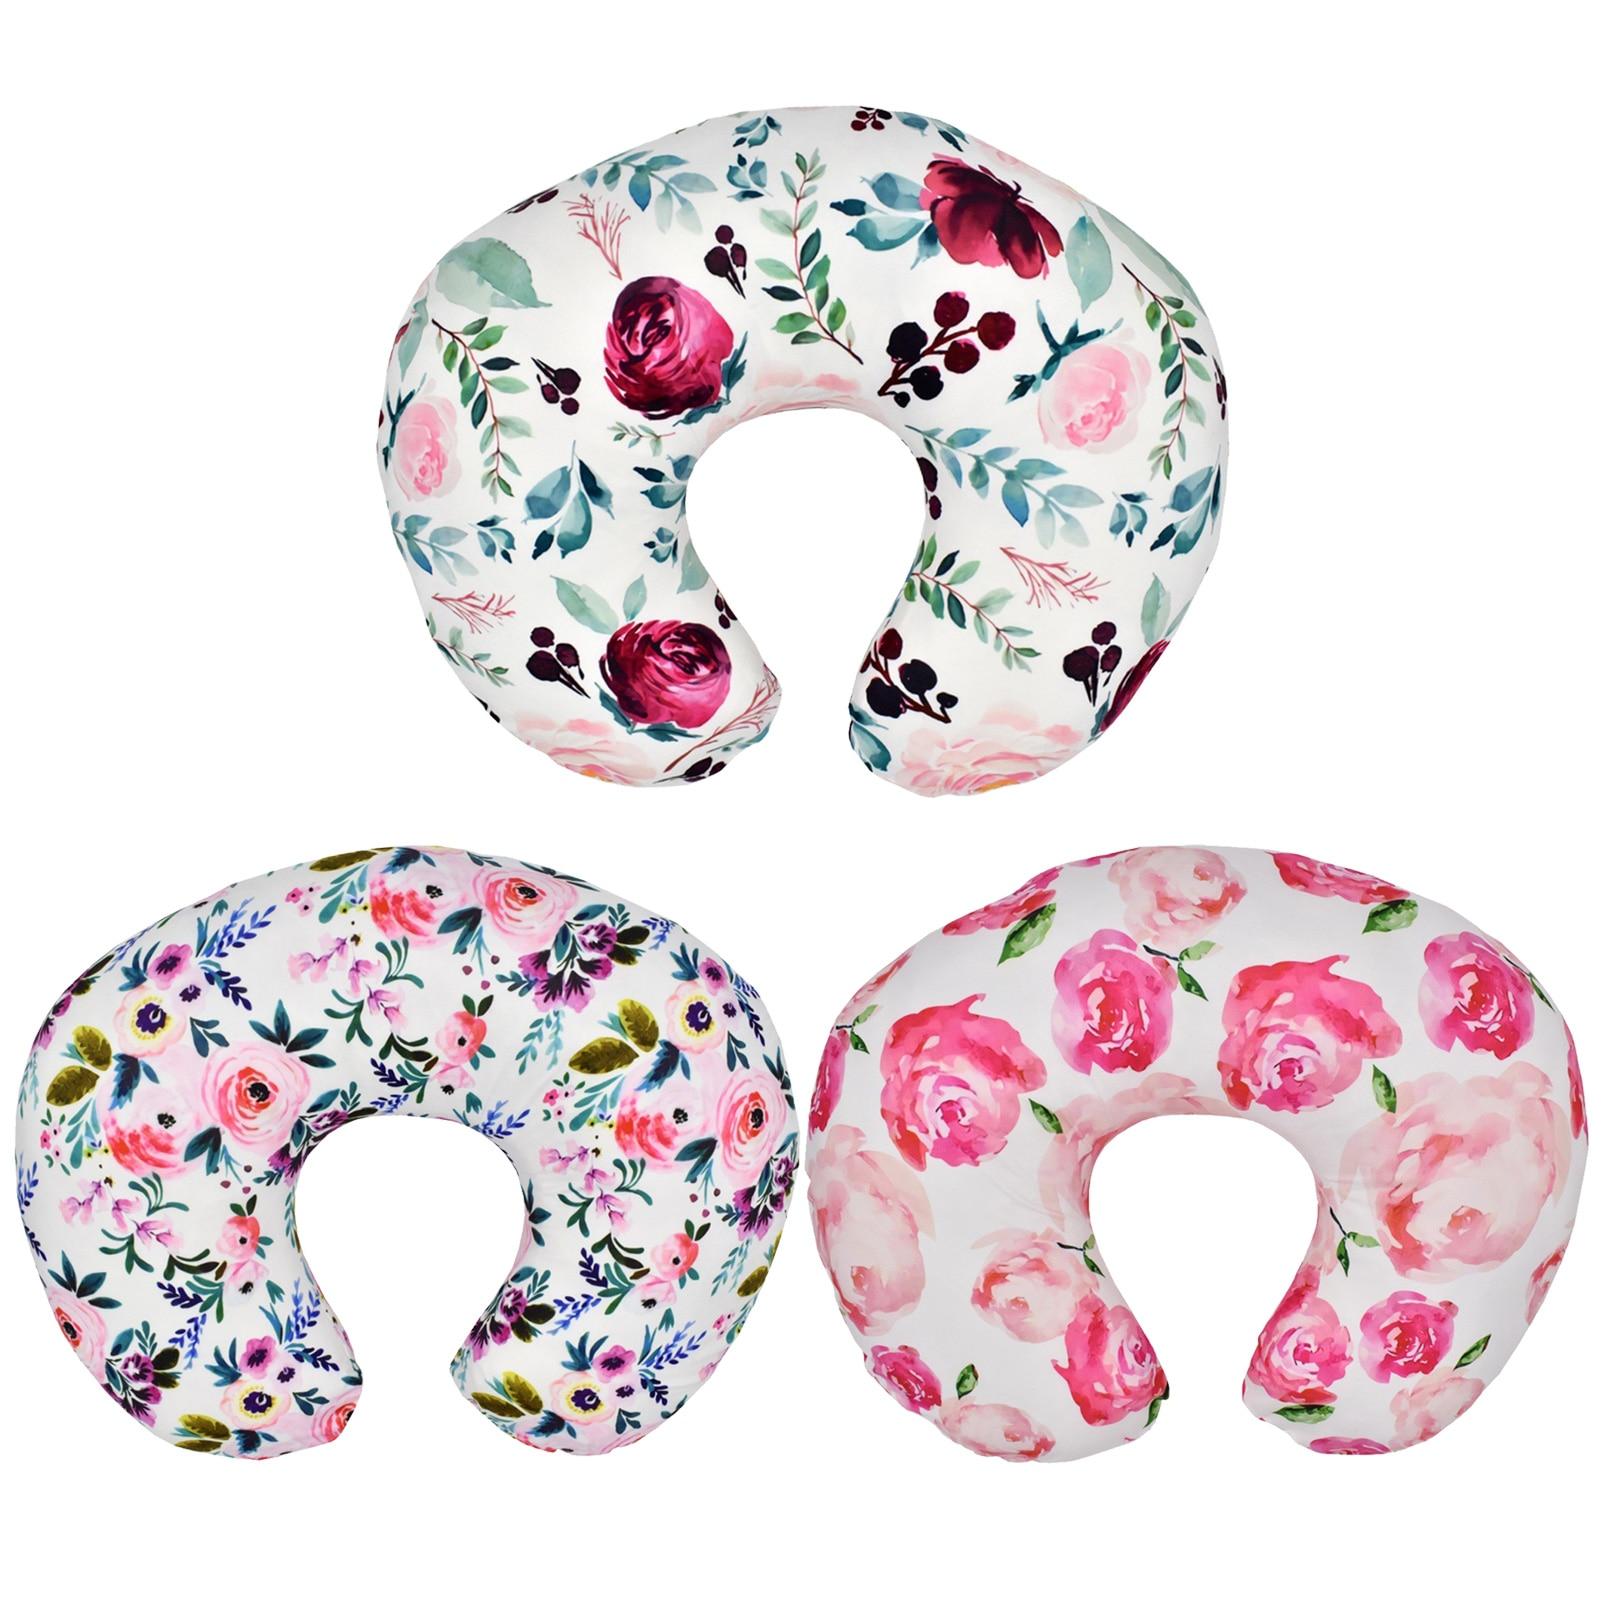 Baby U Type Nursing Pillow Pillowcase Multifunctional Detachable Printing Pillowcase Lactation Pillowcase Removable